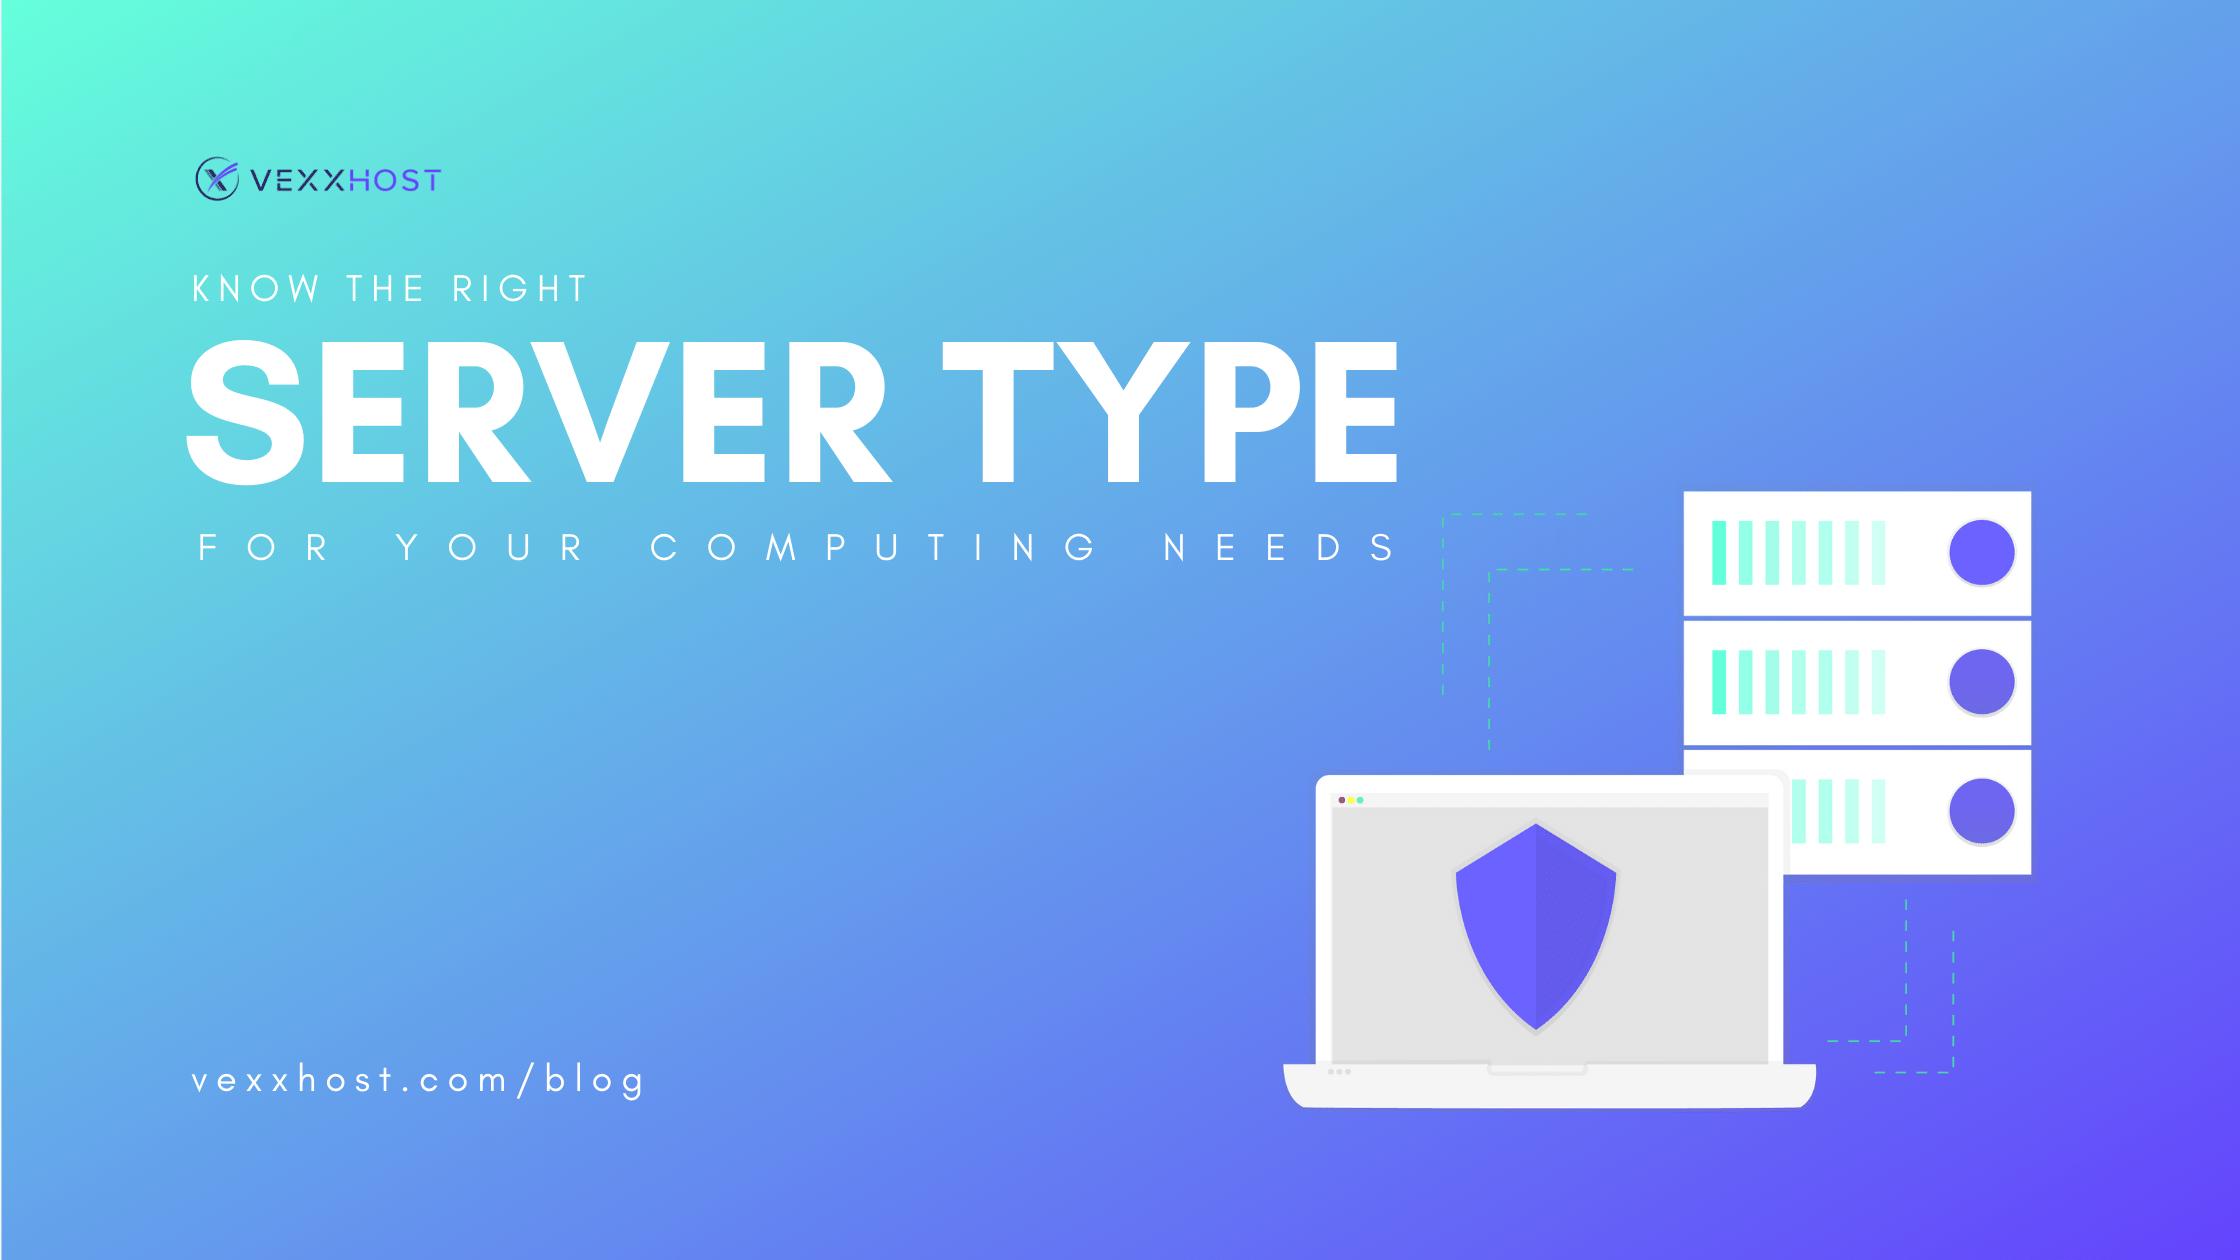 server-type-for-cloud-computing-vexxhost-blog-header